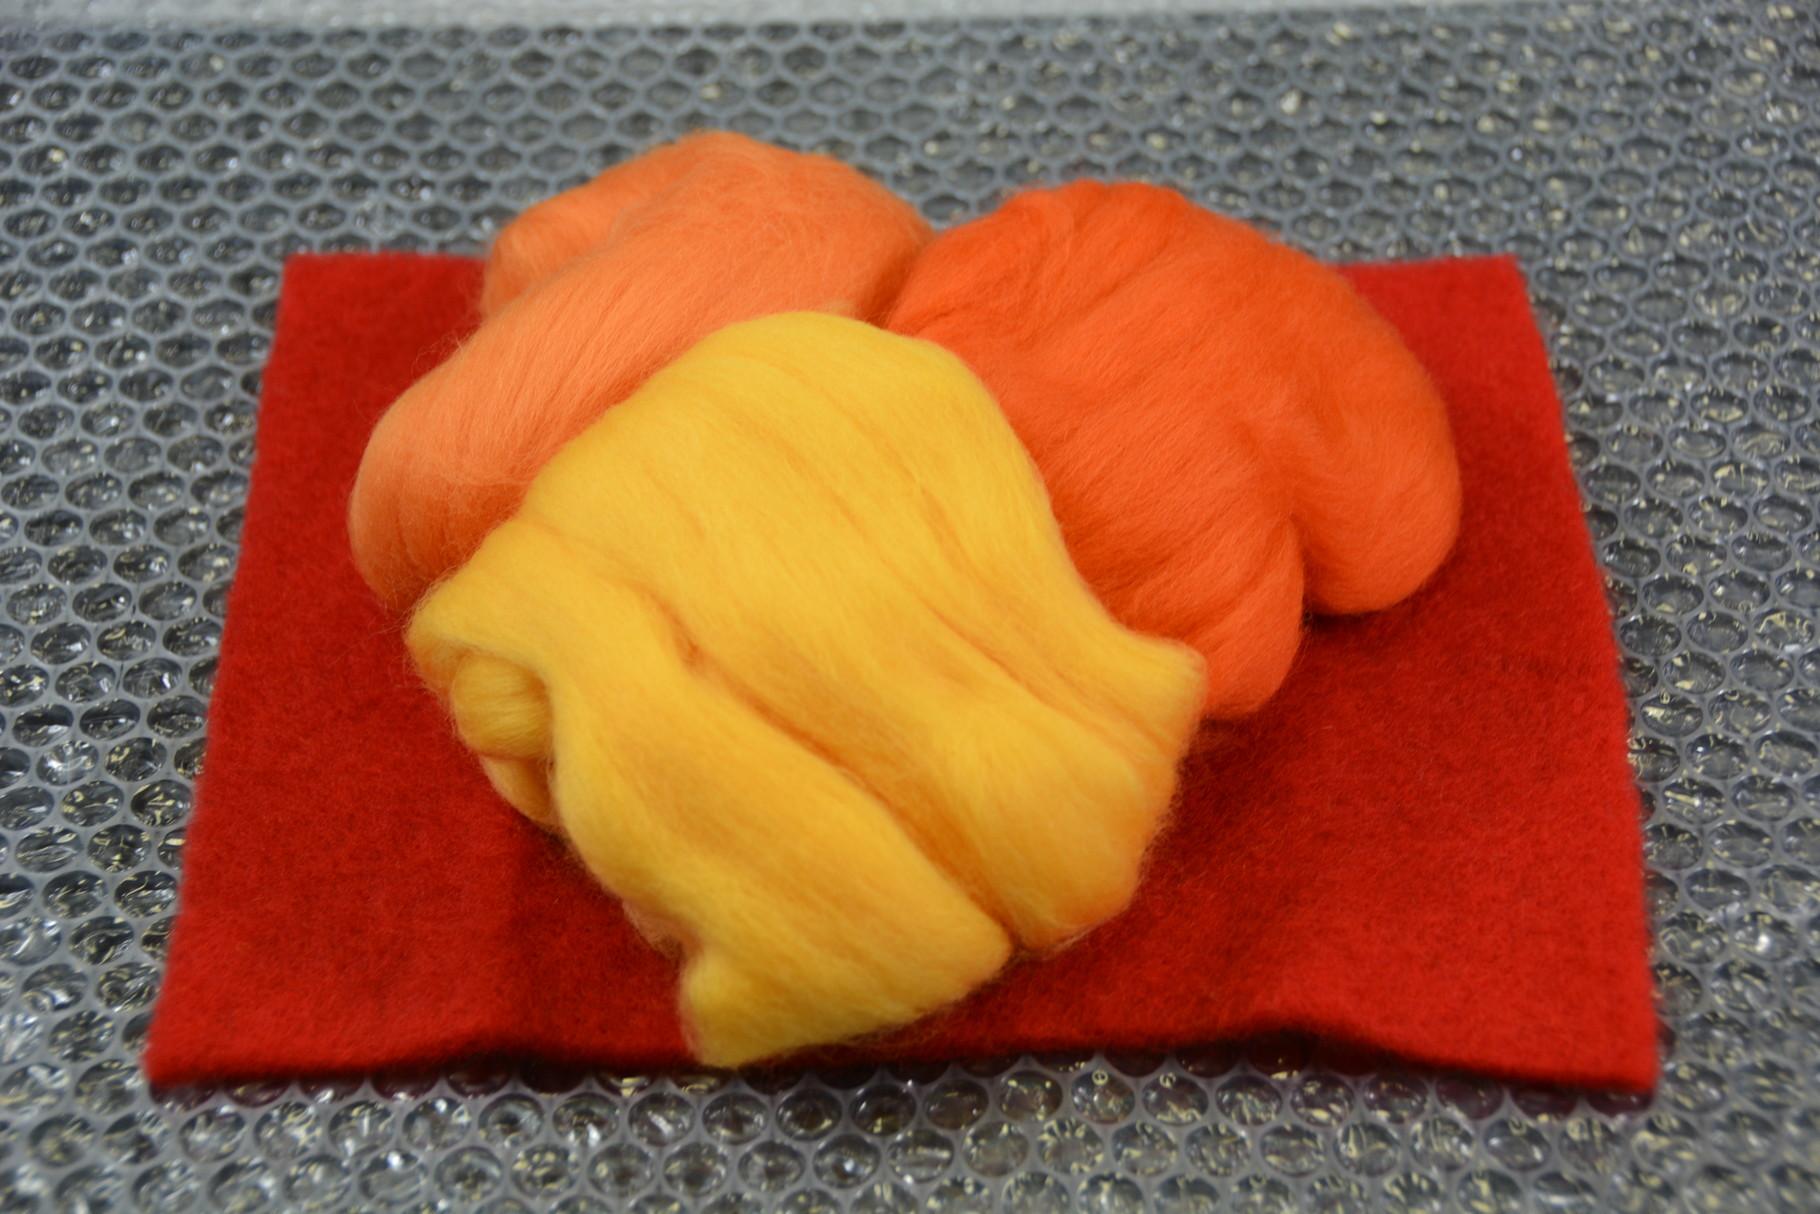 Nadelvlies per Stk. (20 x 25 cm) + Kammzug 10g - erhältlich im Shop